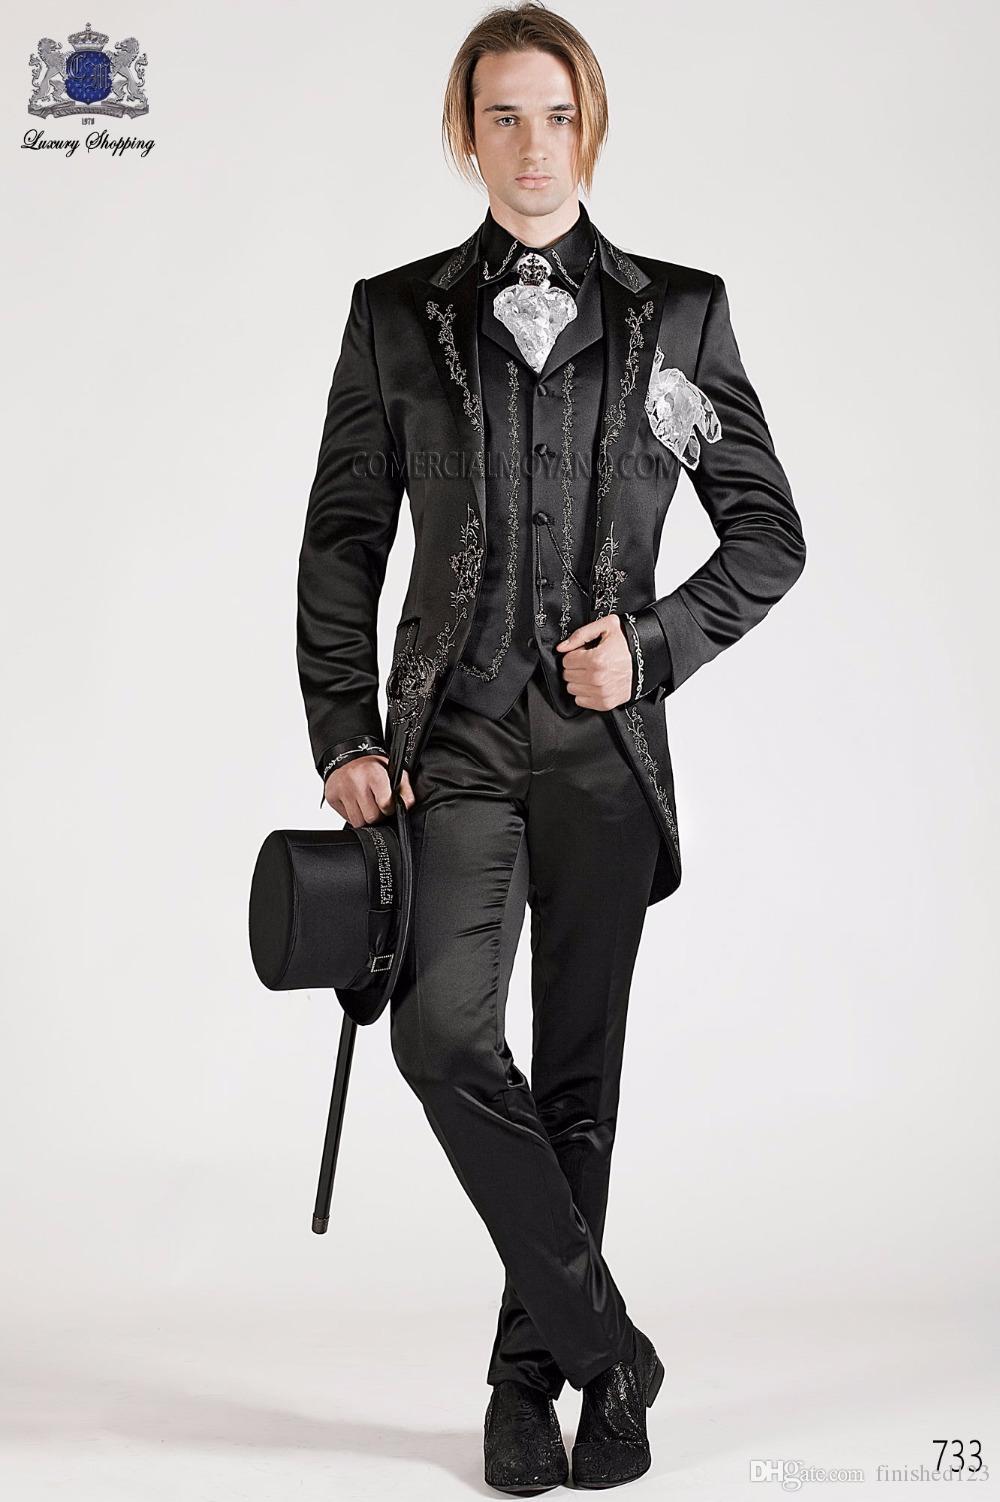 Moda Un Botón Negro Bordado Novio Esmoquin Pico Hombres Solapa Trajes 3 piezas Boda Prom Chaqueta (Chaqueta + Pantalones + Chaleco) W492